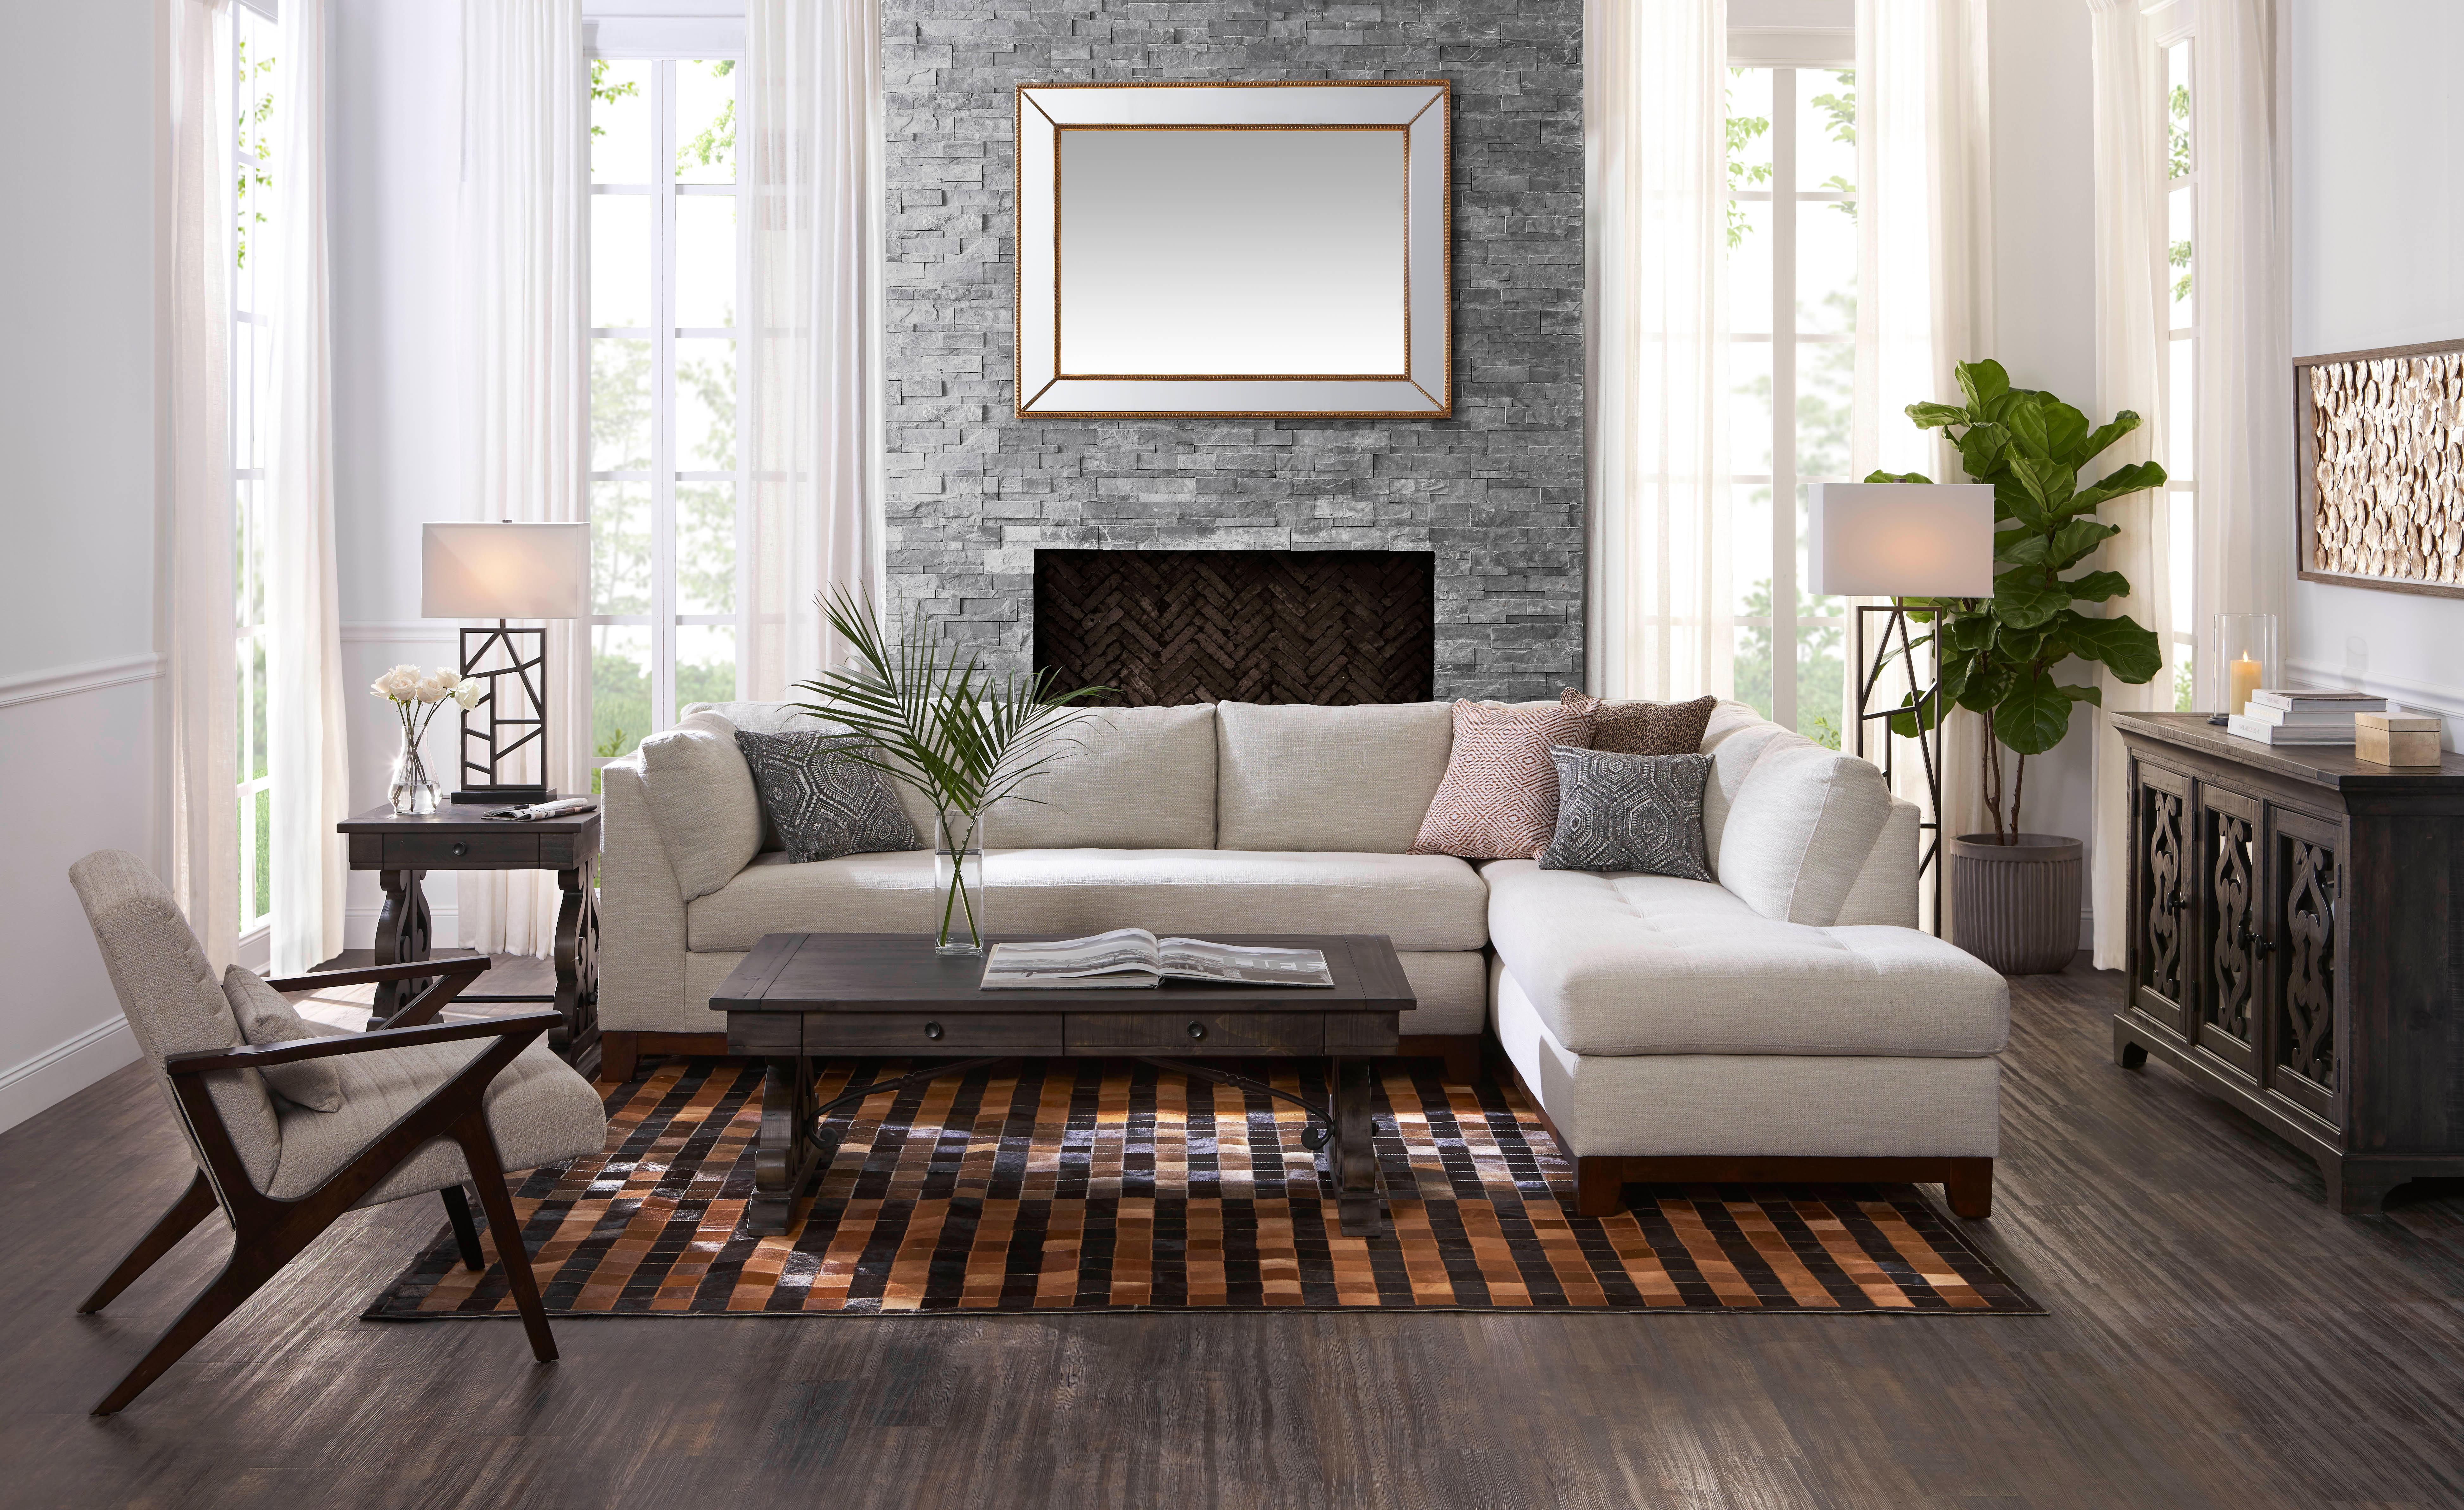 Value City Furniture 13 South Boulevard,, Charlotte, NC 13